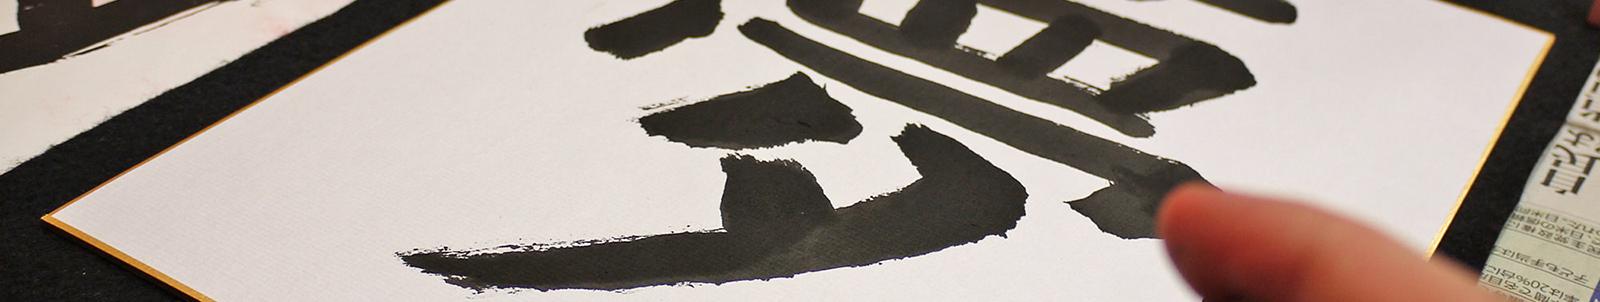 Calligraphy - Dream